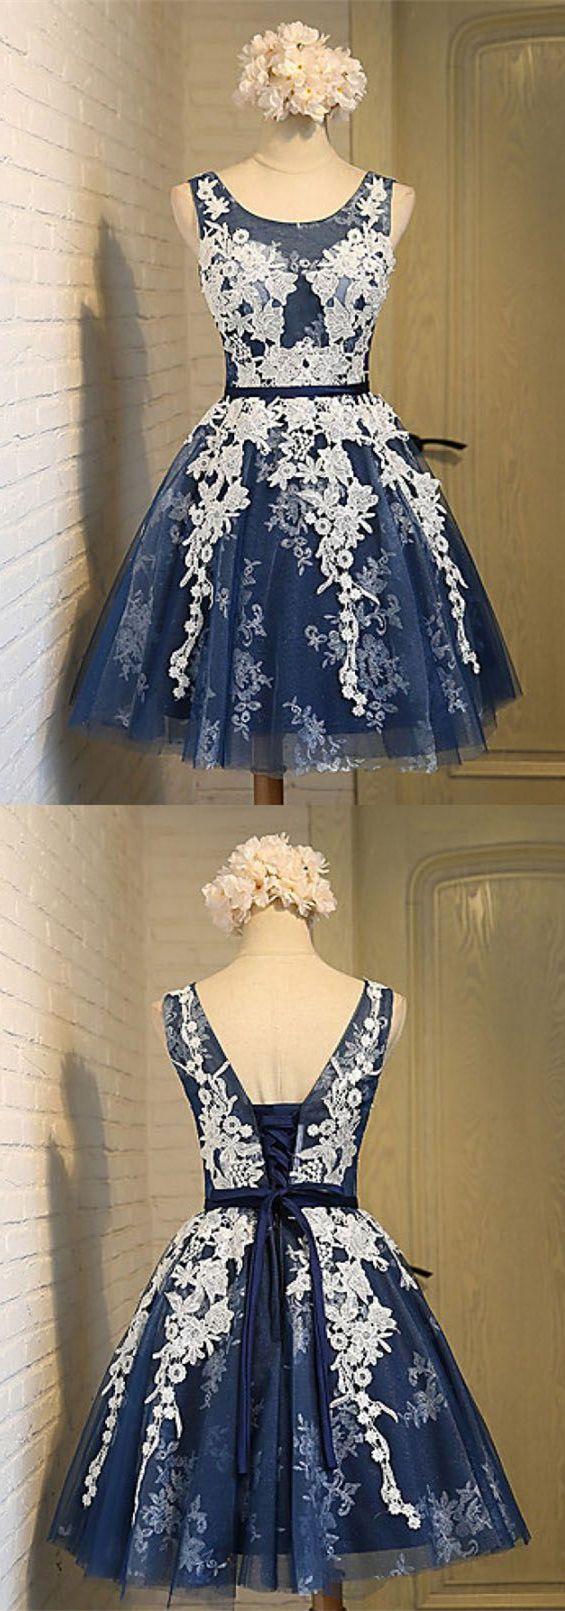 Aline scoop appliques dark blue homecoming dress in